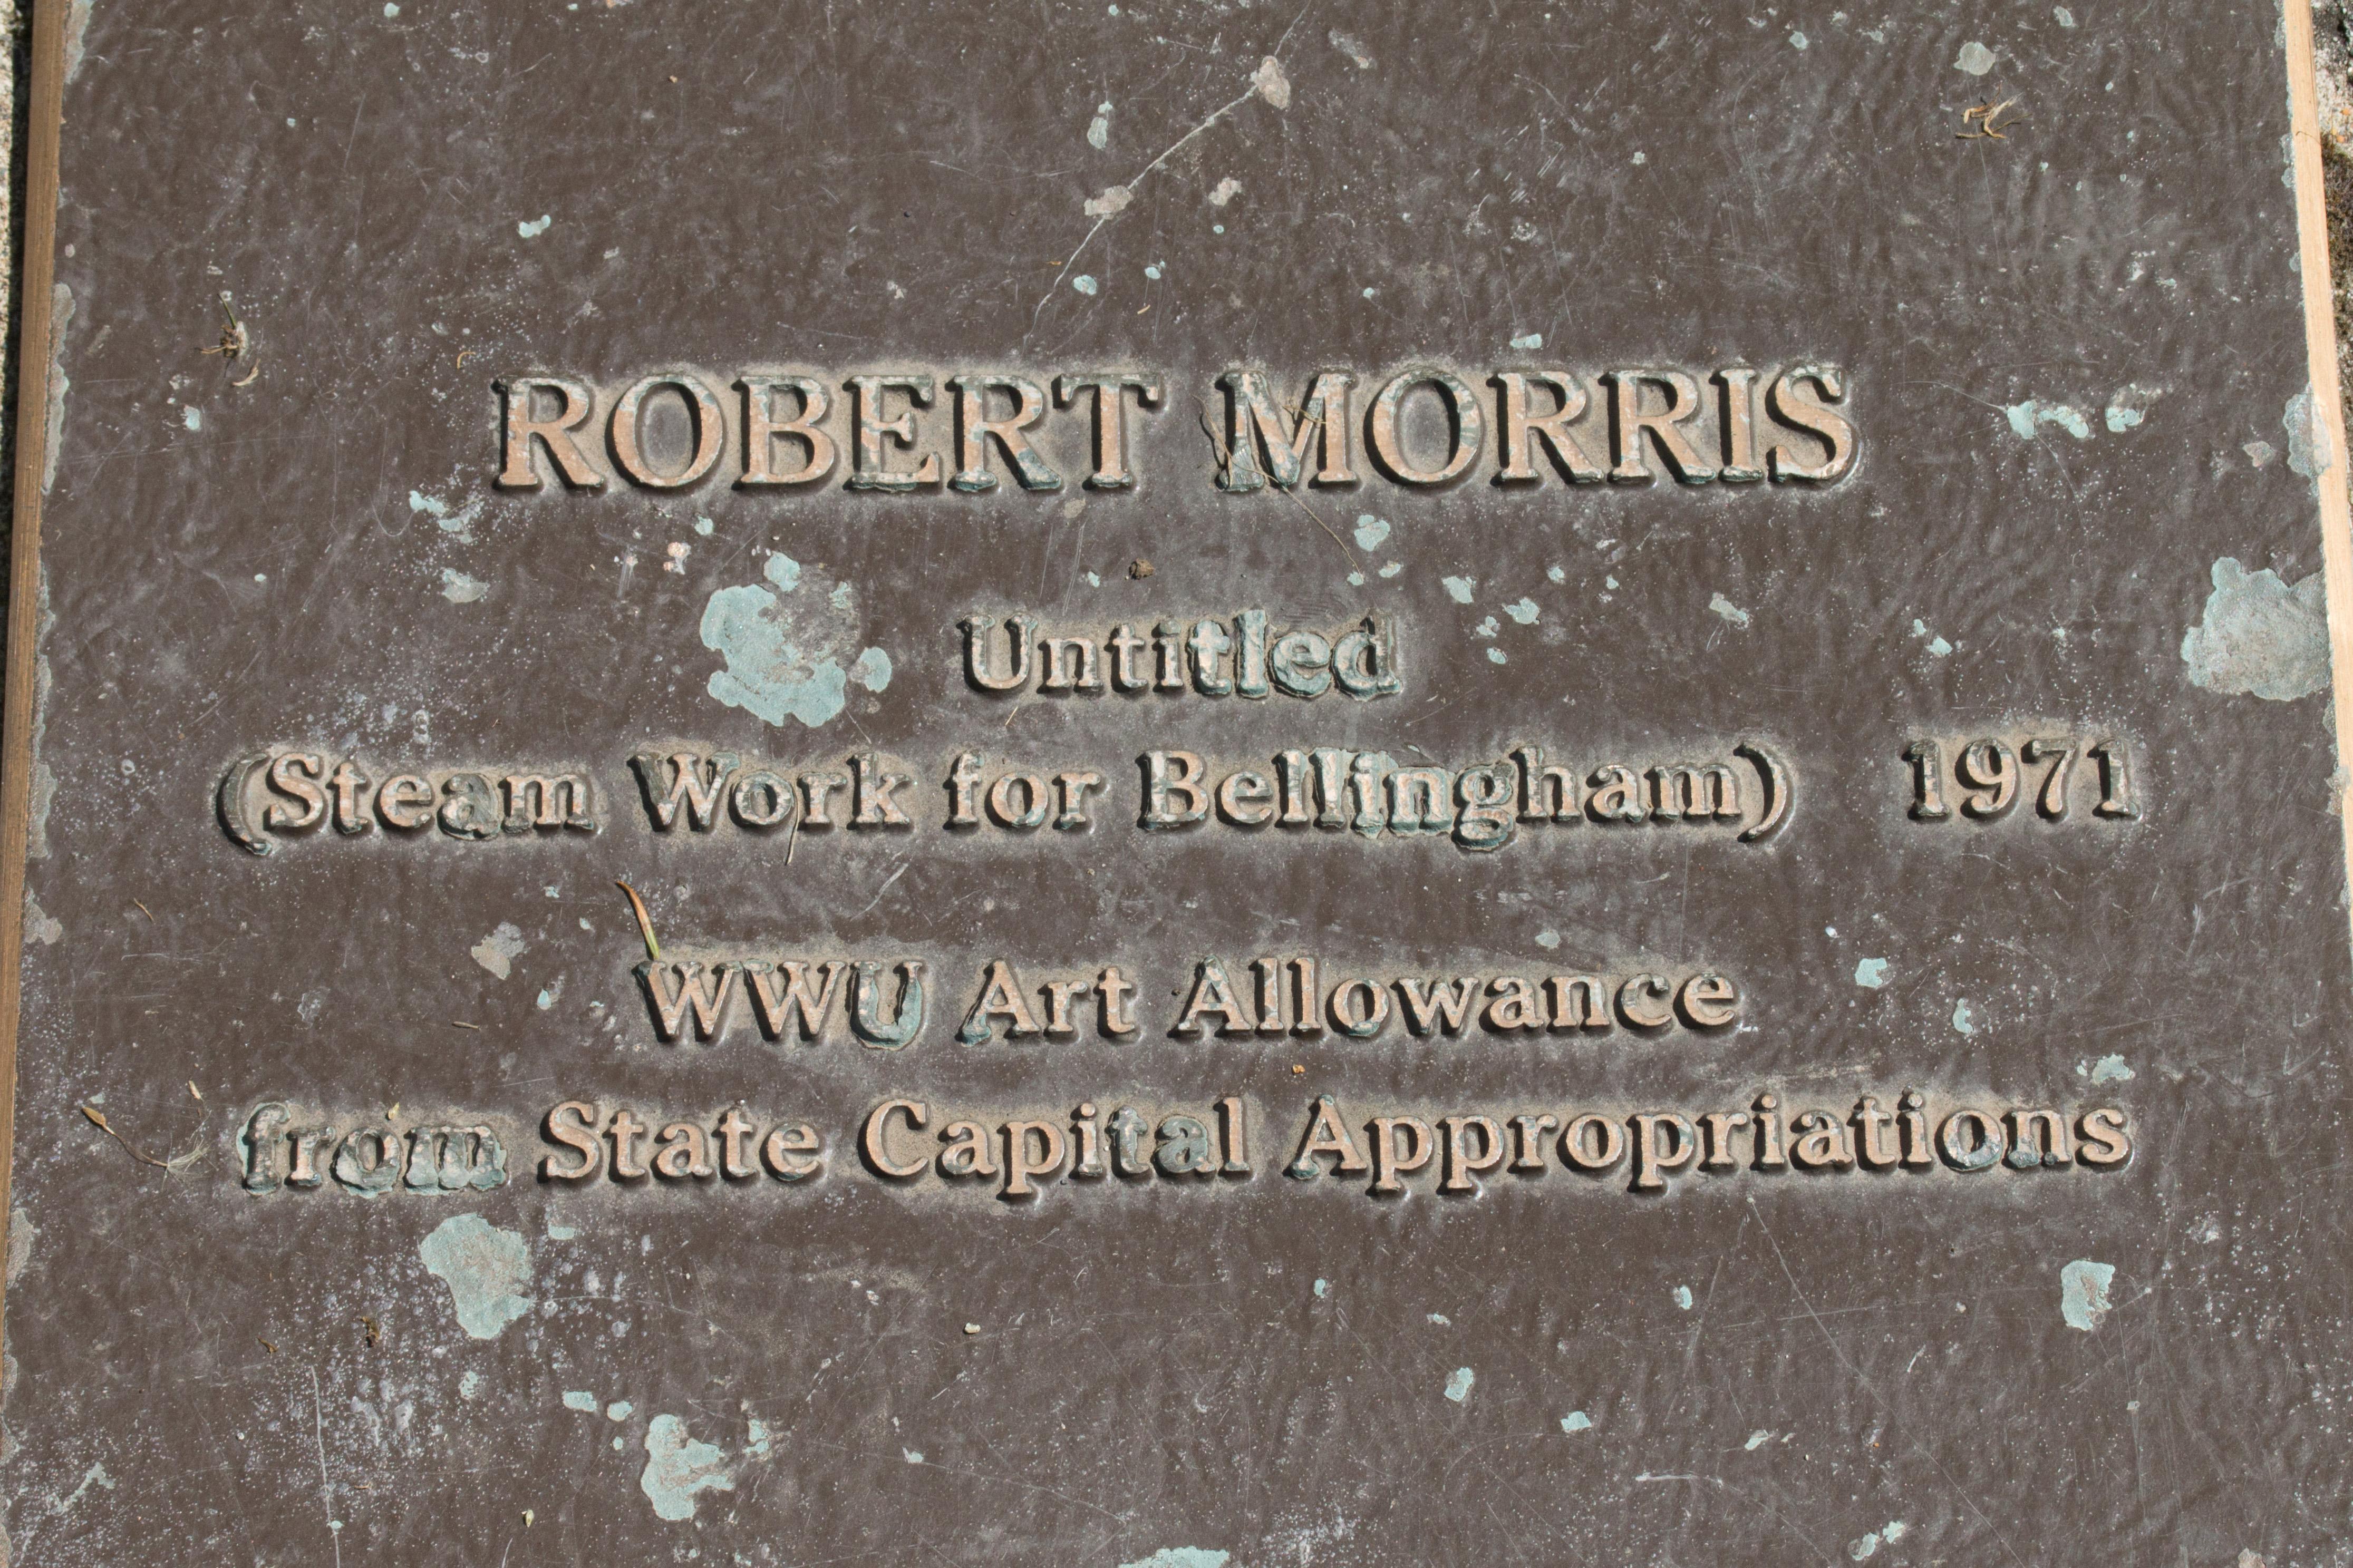 Experience Untitled (Steam Work for Bellingham)- Robert Morris